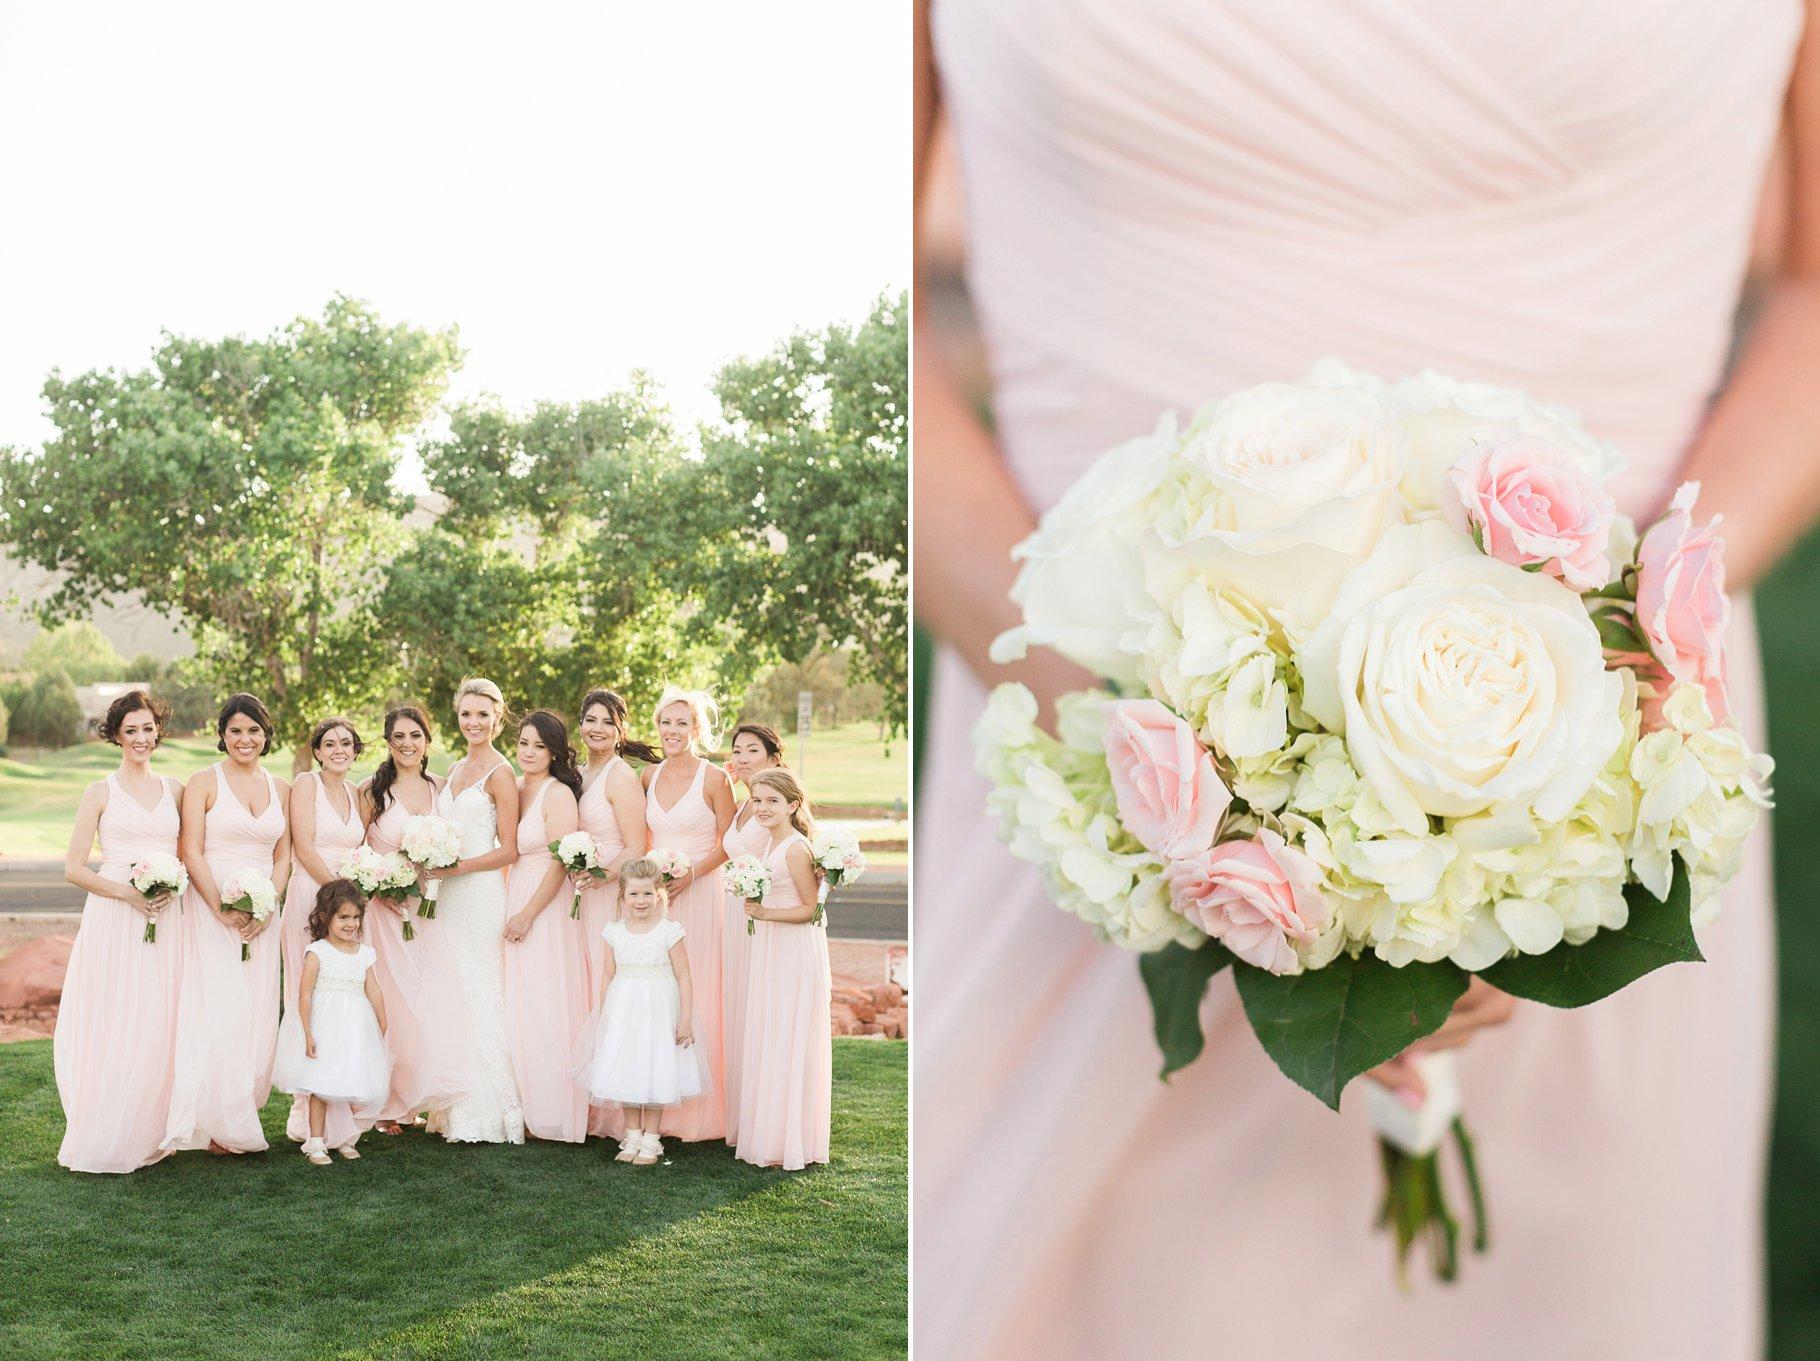 sedona wedding-106_GRETCHEN WAKEMAN PHOTOGRAPHY.jpg